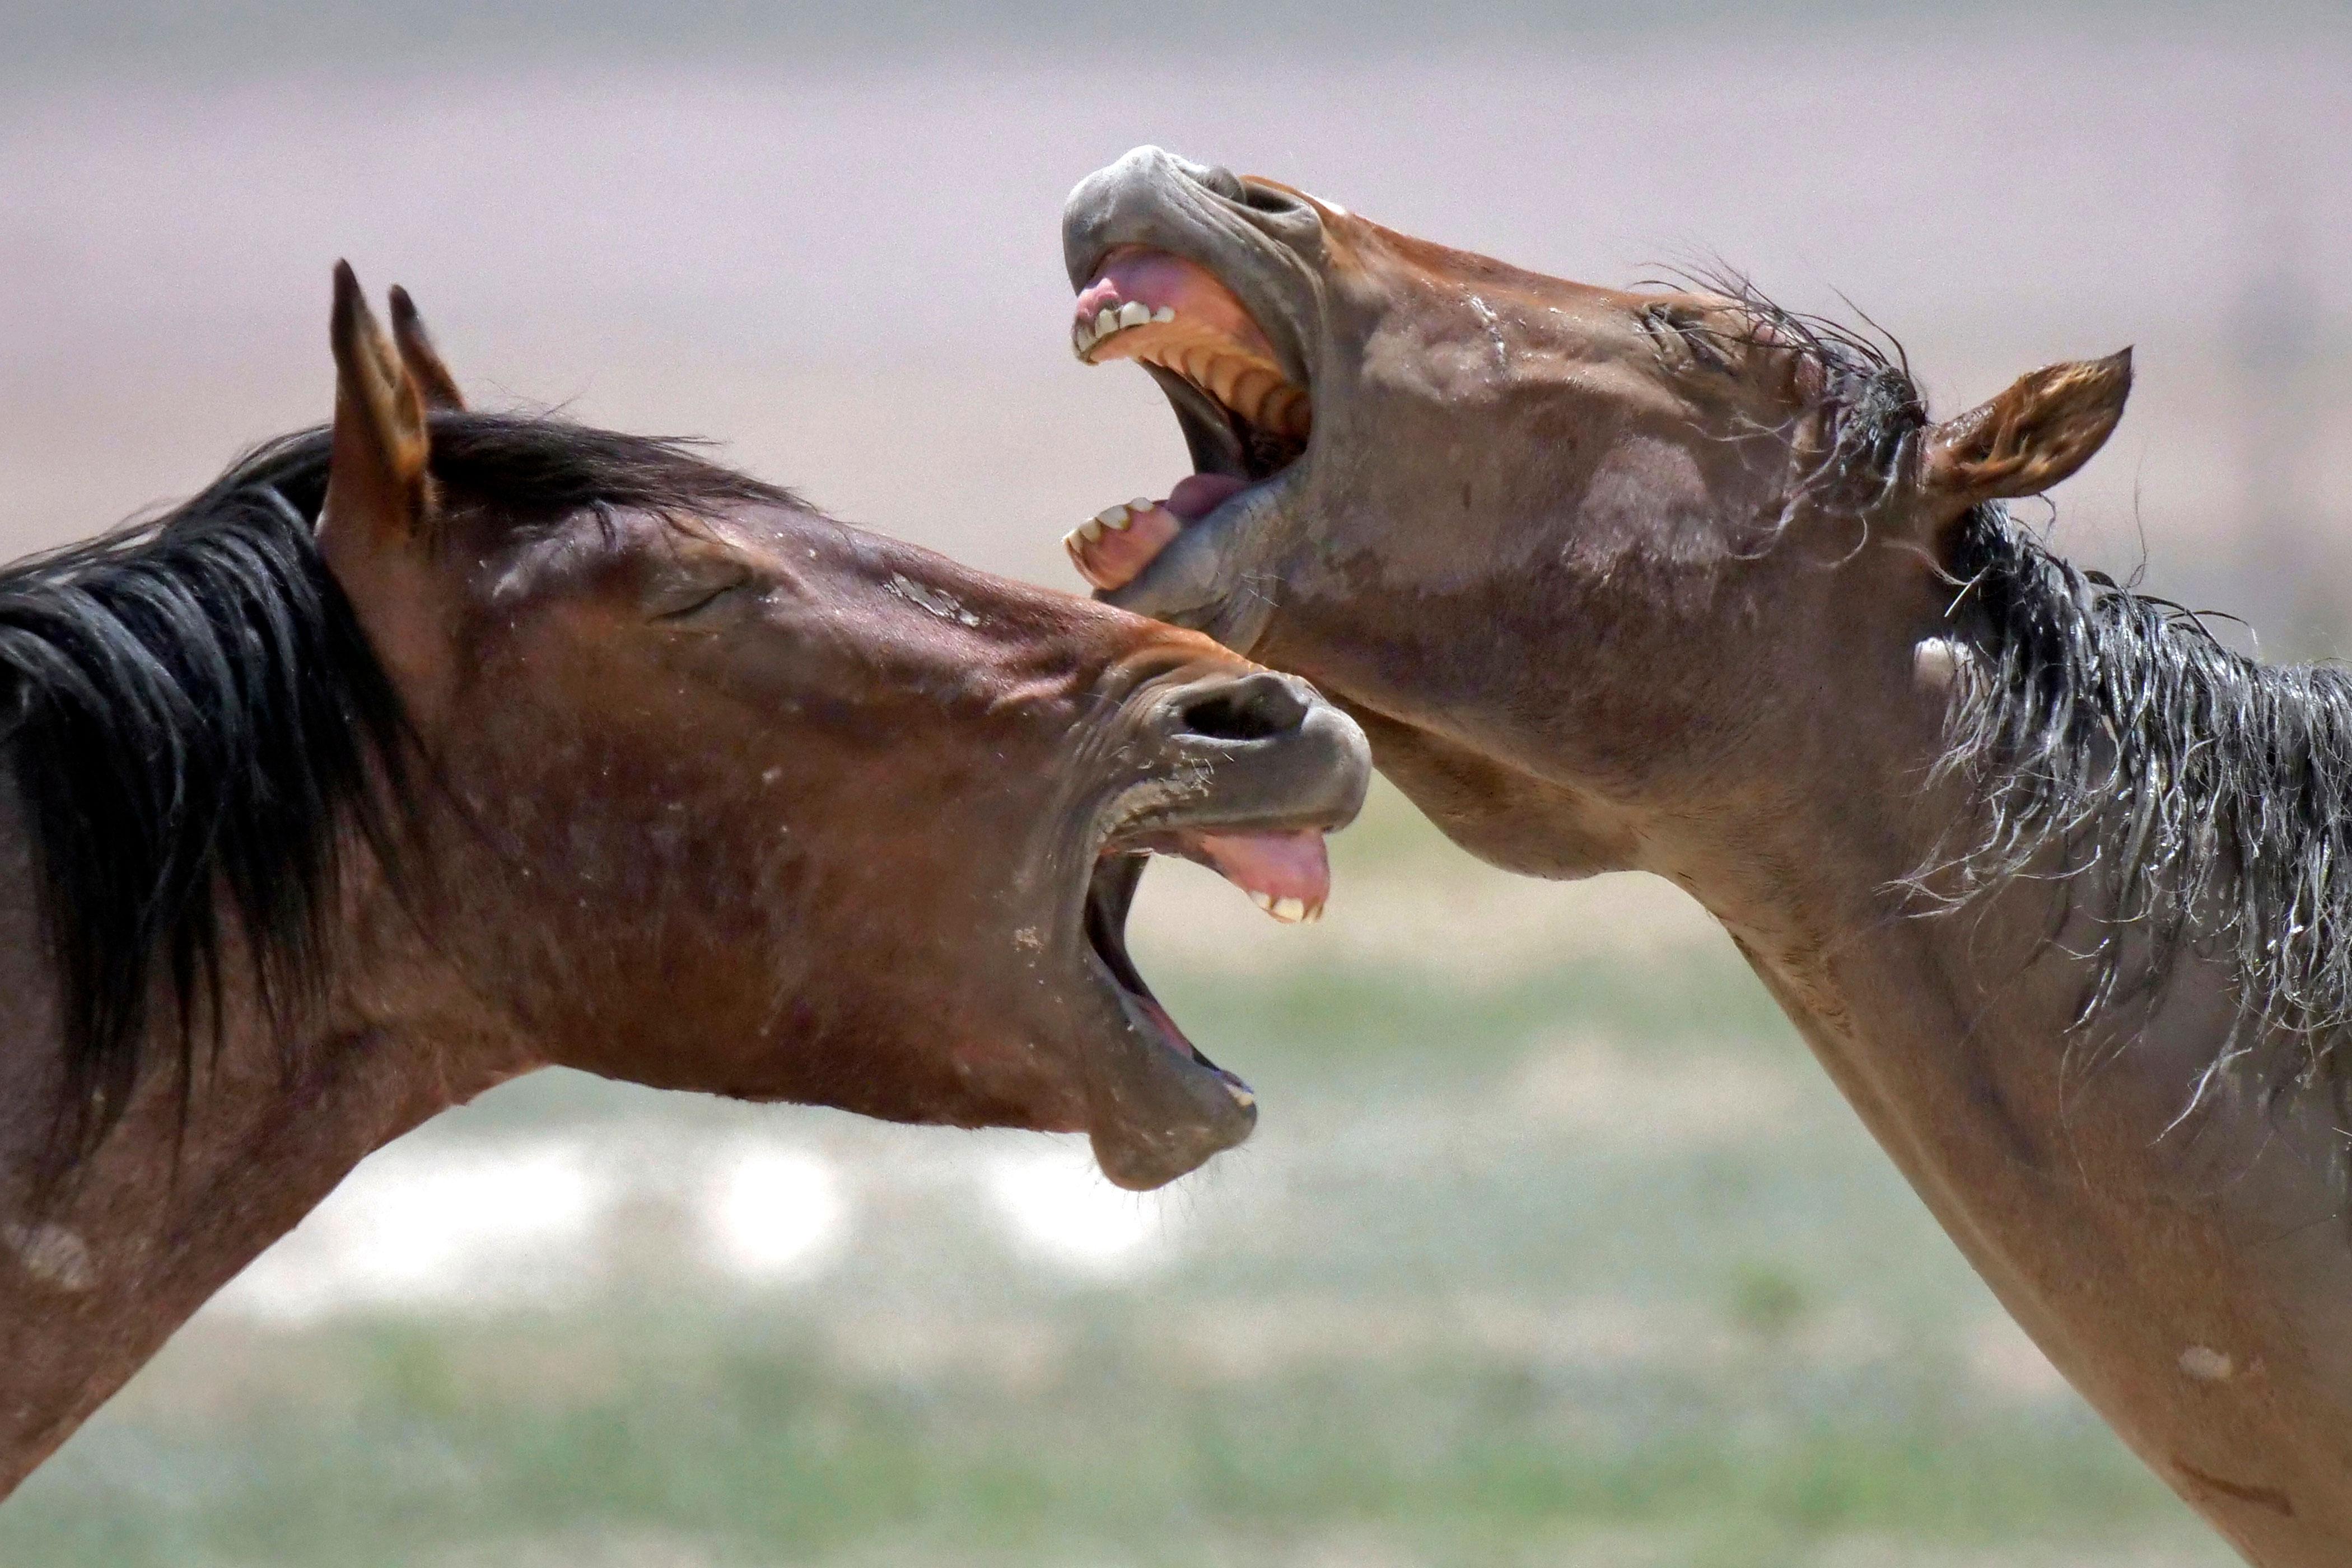 Wild horses occupy a watering hole outside Salt Lake City, Utah, June 29, 2018.